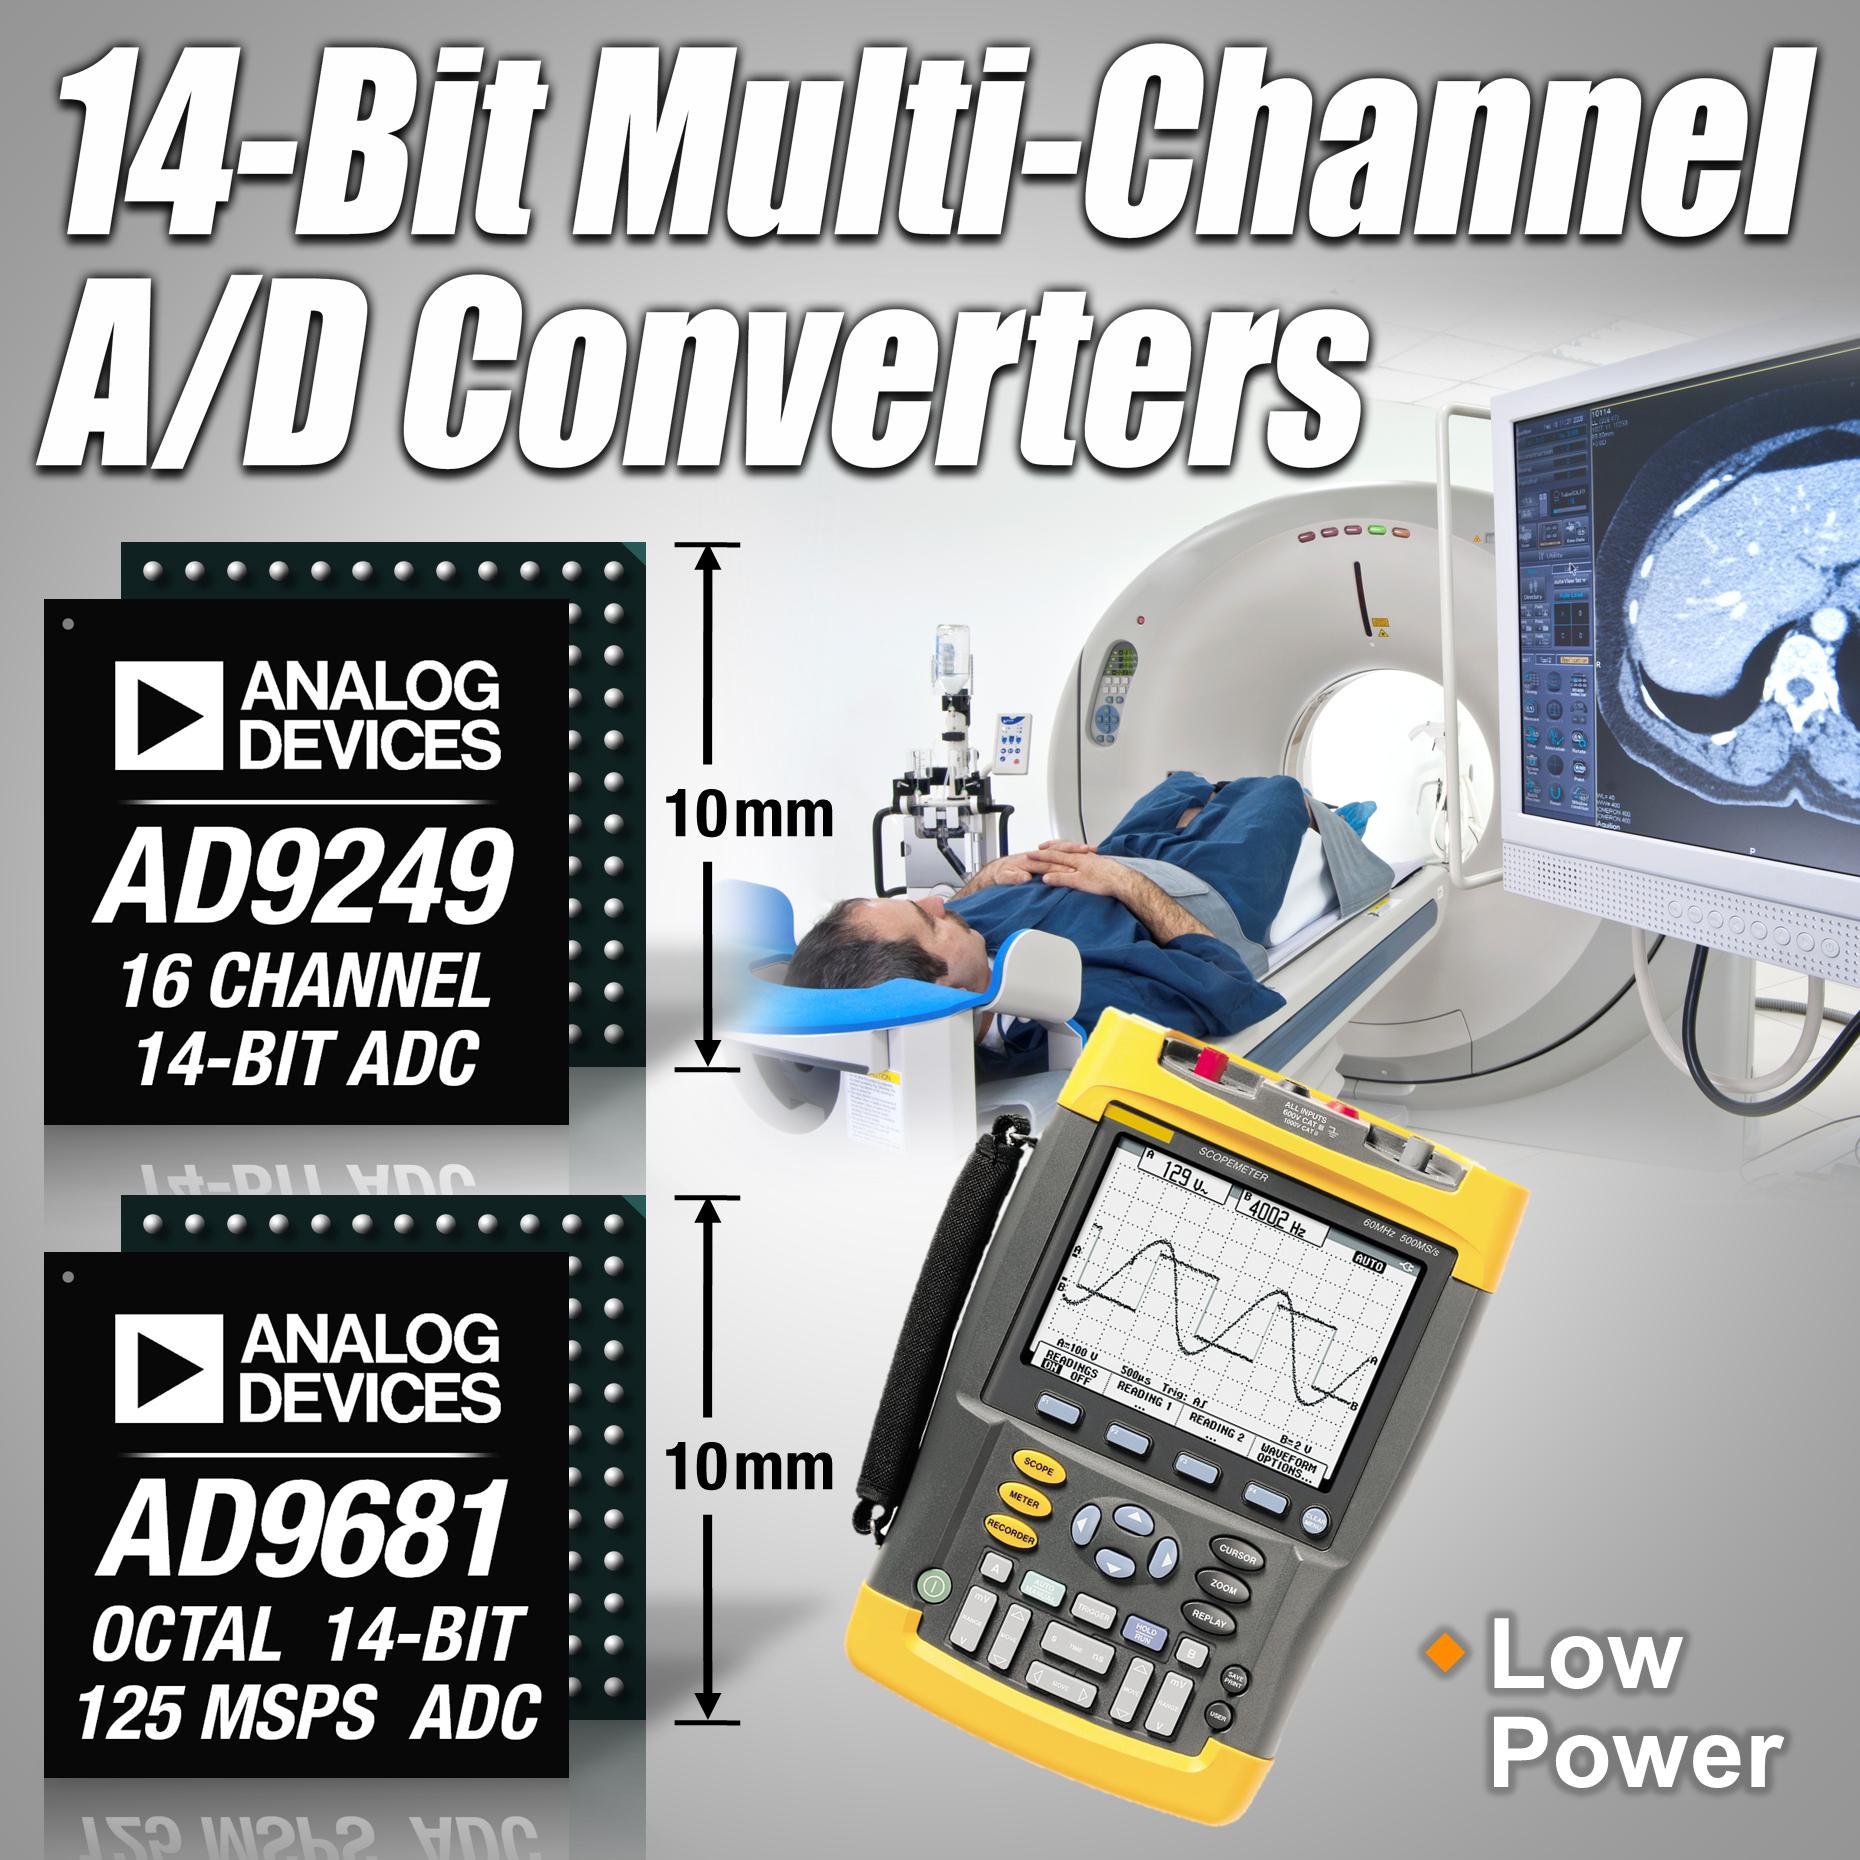 Low Power 14 Bit A D Converters Enable High Performance Multi Octal Speed Analog Devices Bob Olson 781 937 1666 Bobolsonanalogcom Or Porter Novelli Andrew Maclellan 617 897 8270 Andrewmaclellanporternovellicom